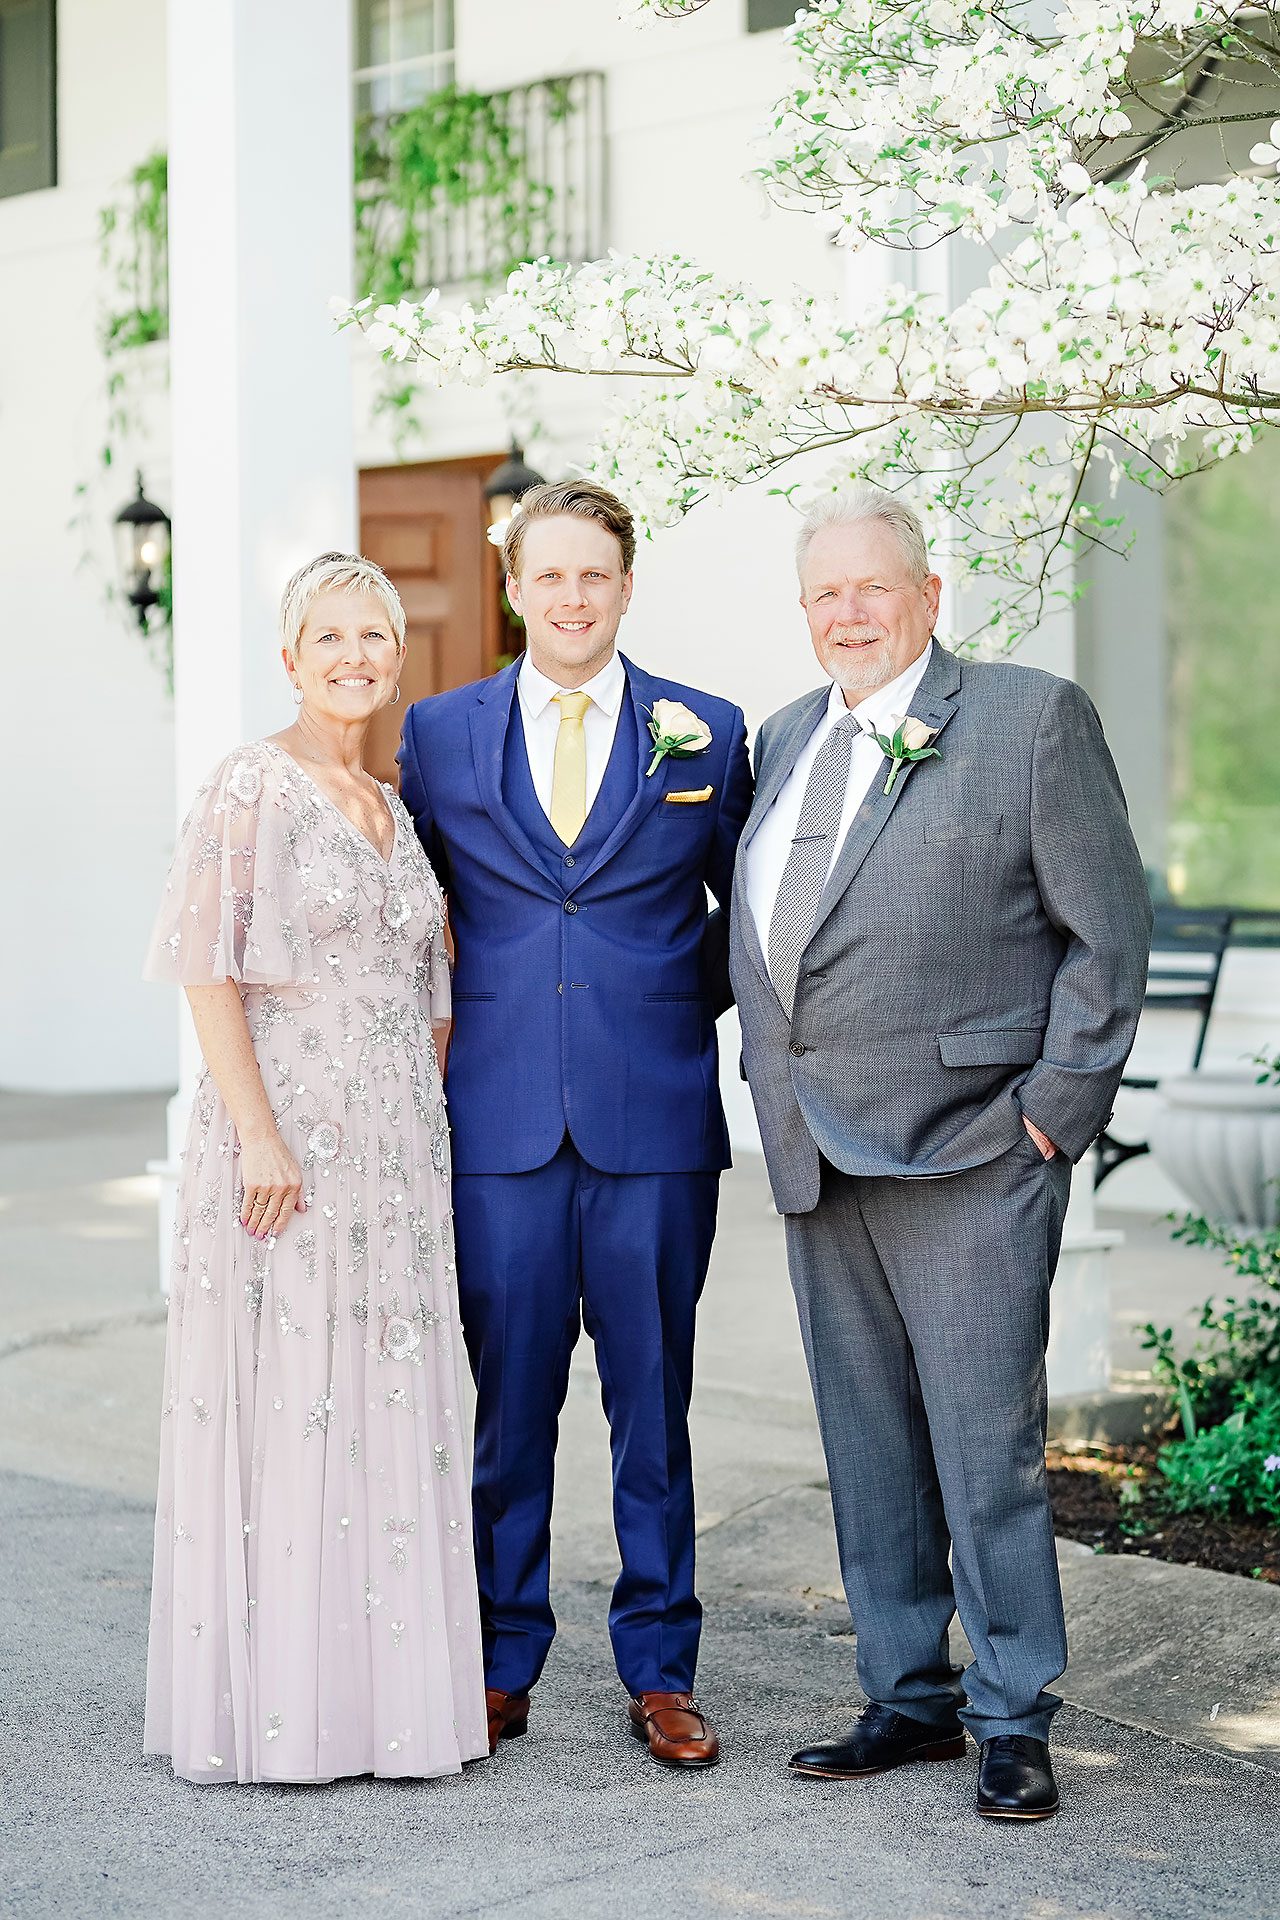 Nadia Parker Black Iris Estate Carmel Indiana Wedding May 2021 153